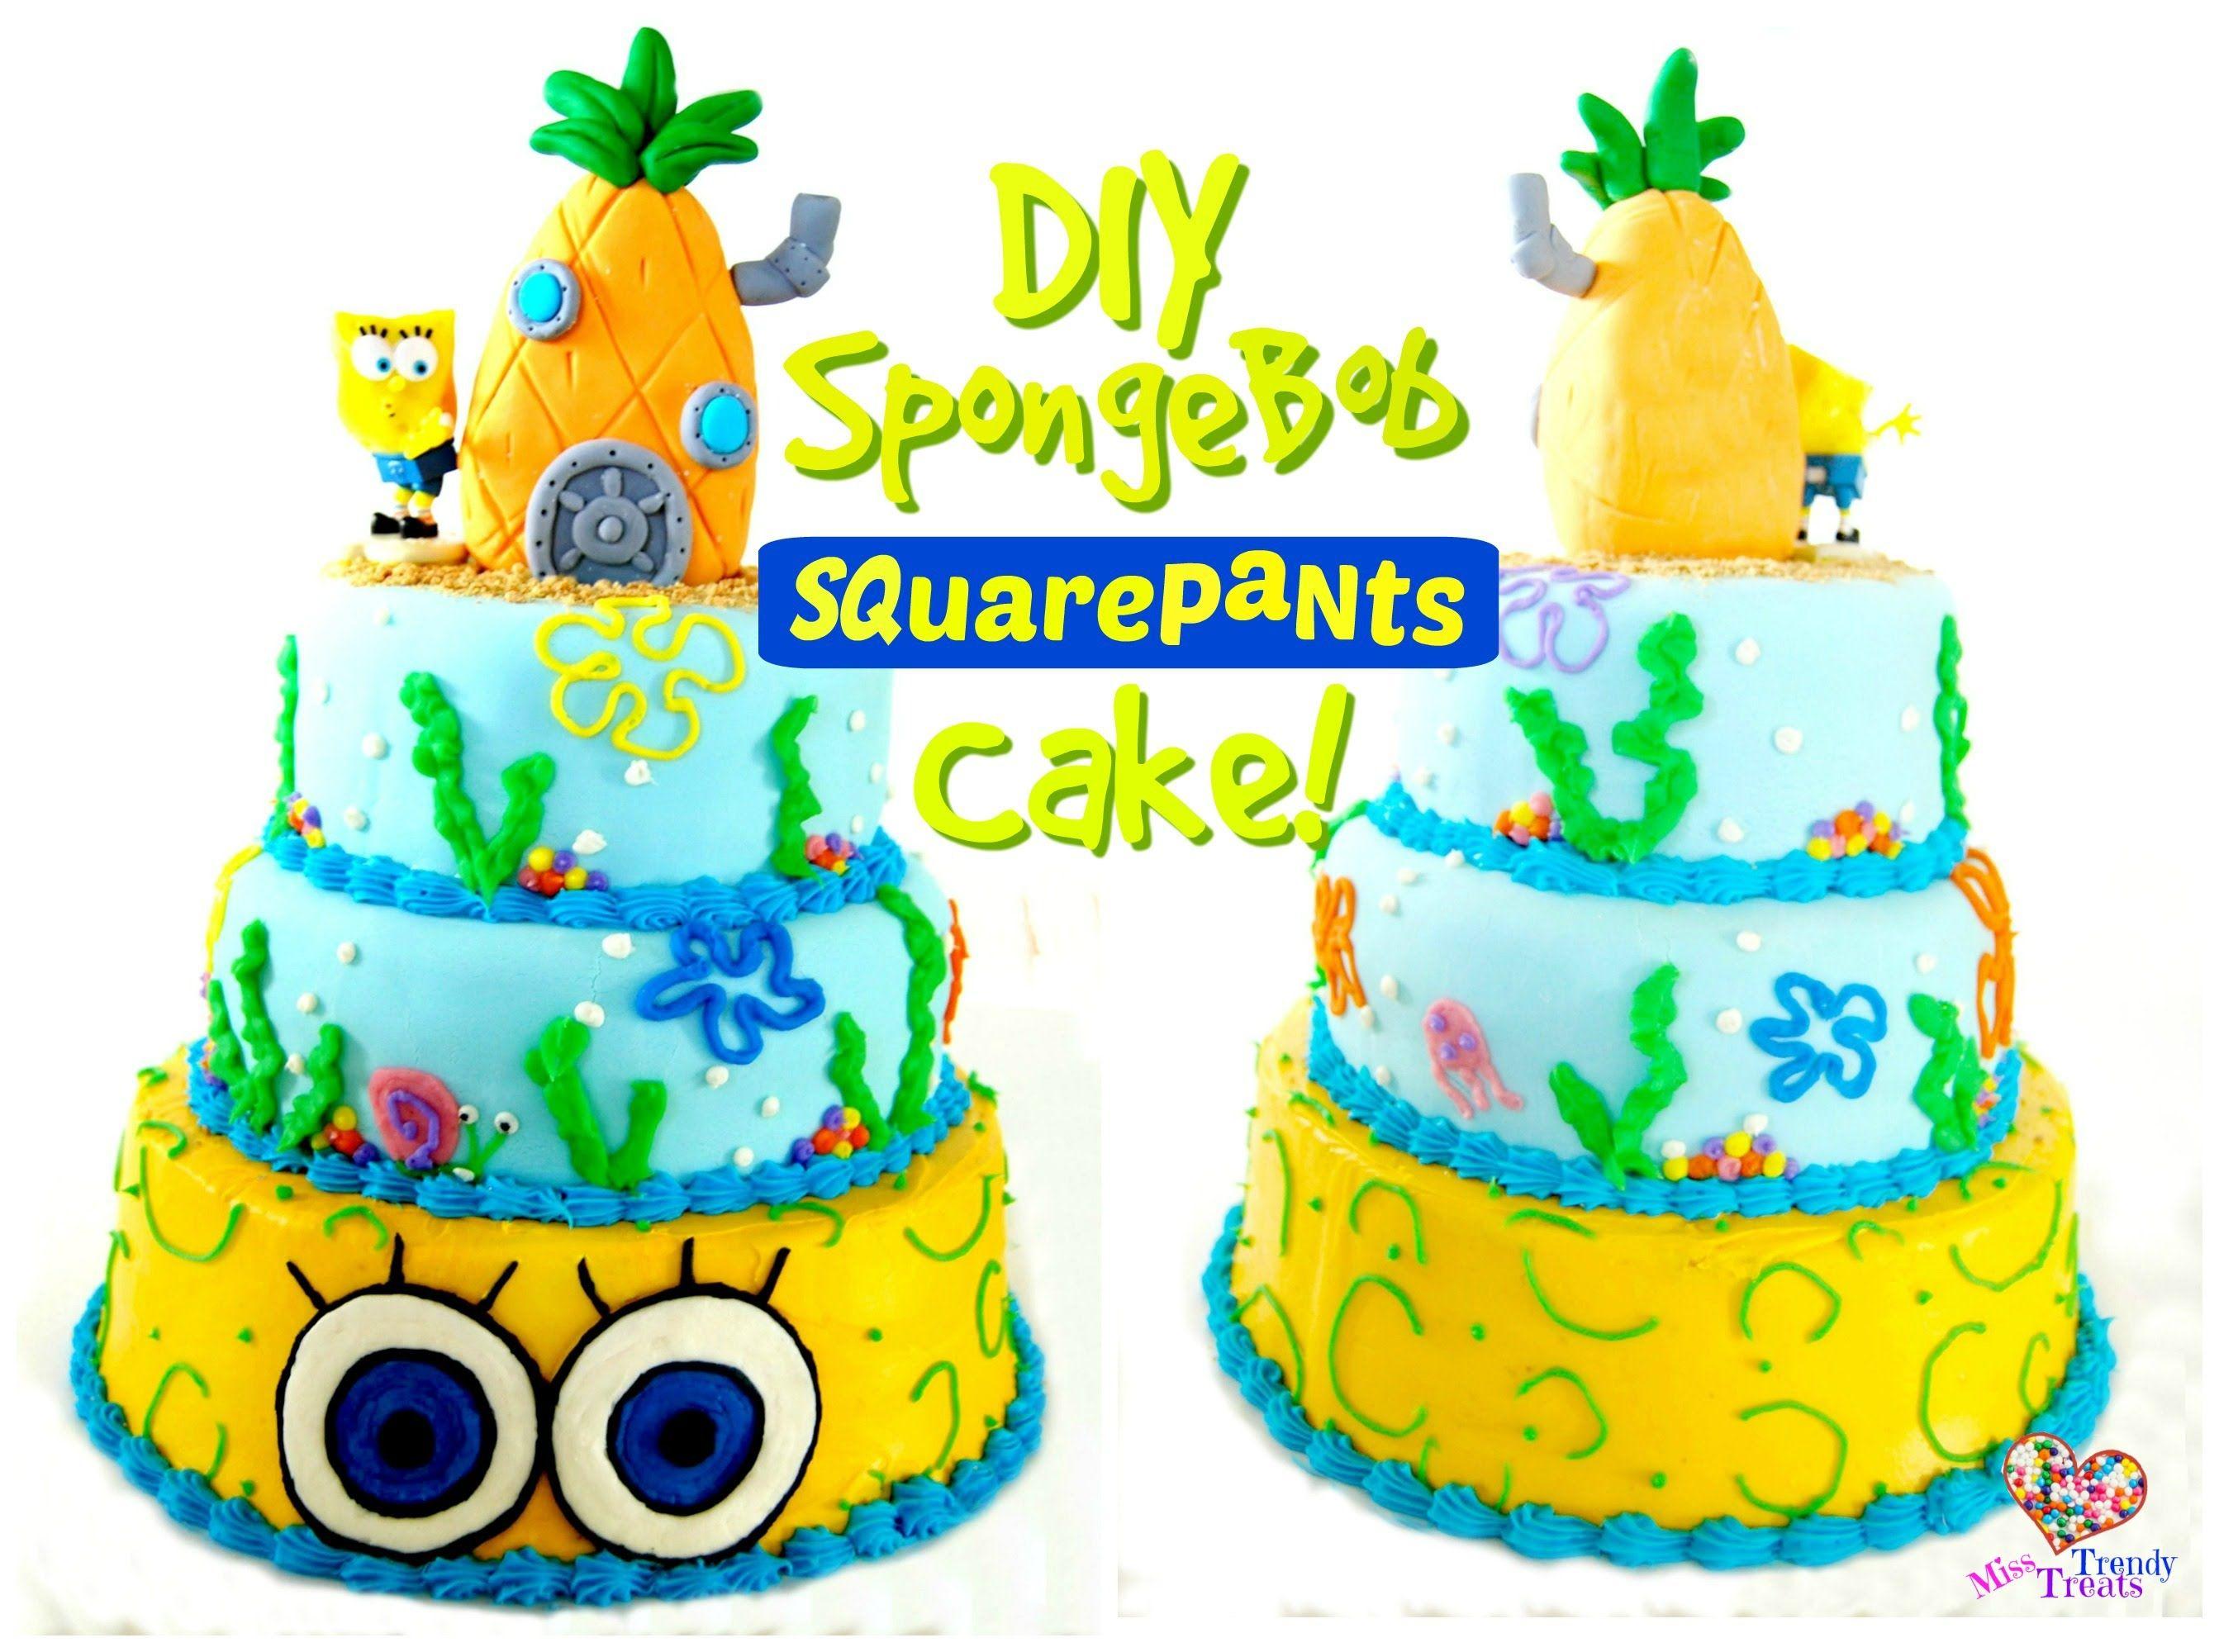 Fun spongebob cake with a rice krispie pineapple cake